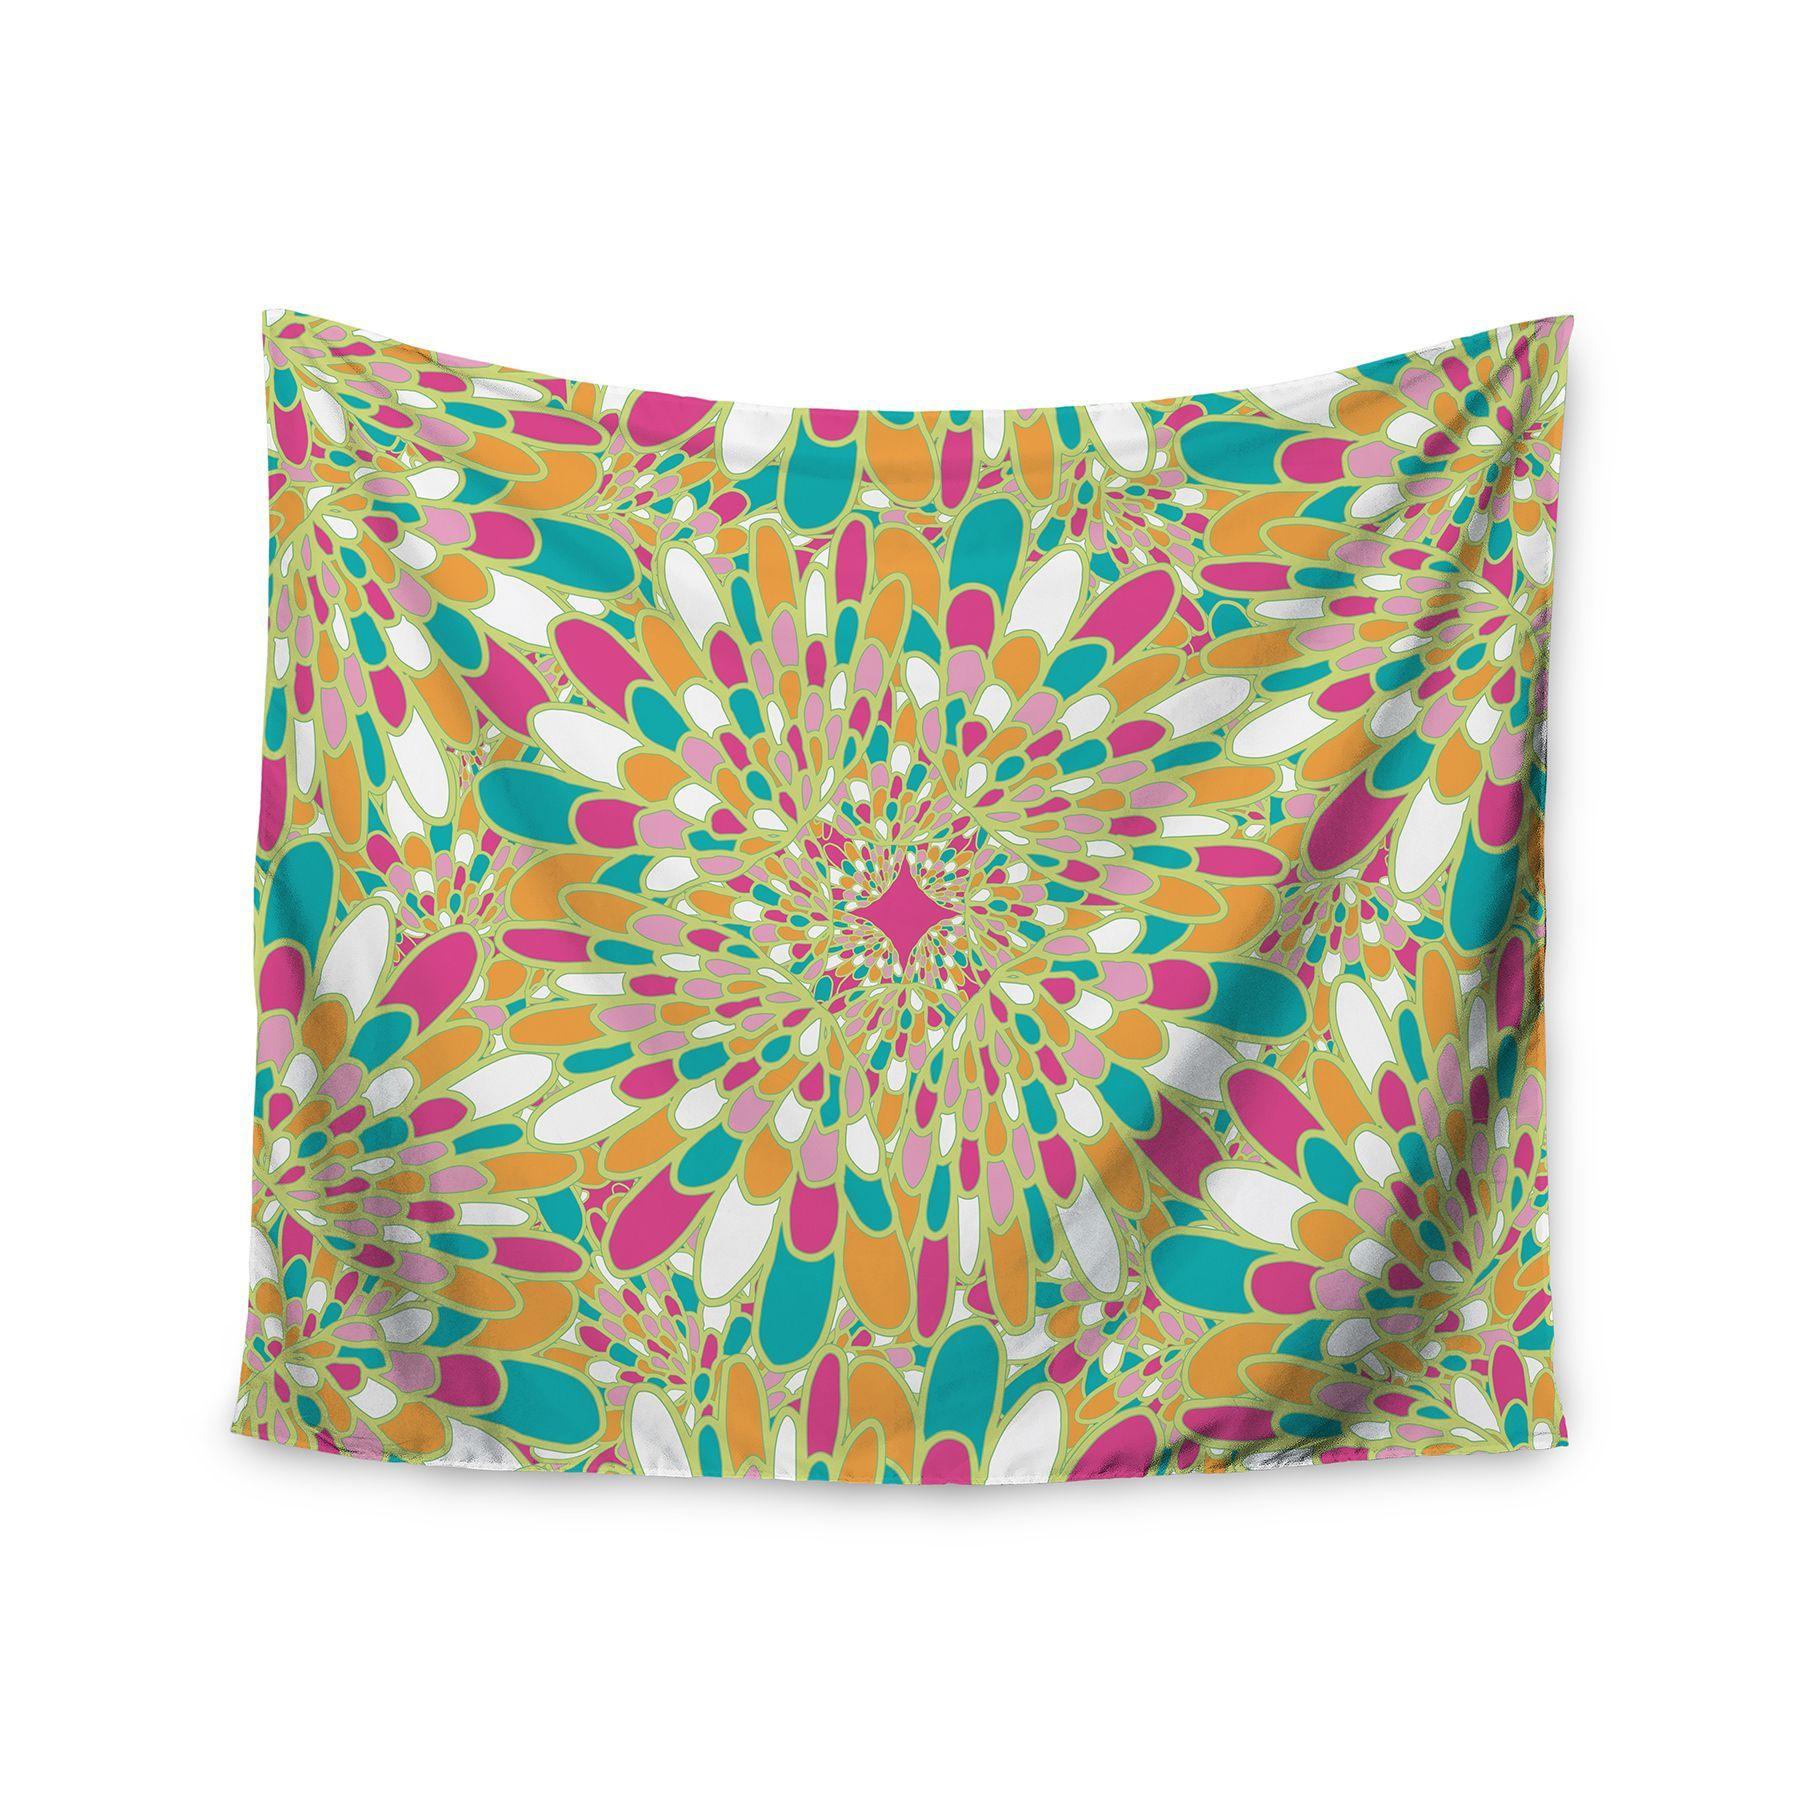 Kess InHouse Miranda Mol 'Flourishing Green' 51x60-inch Wall Tapestry